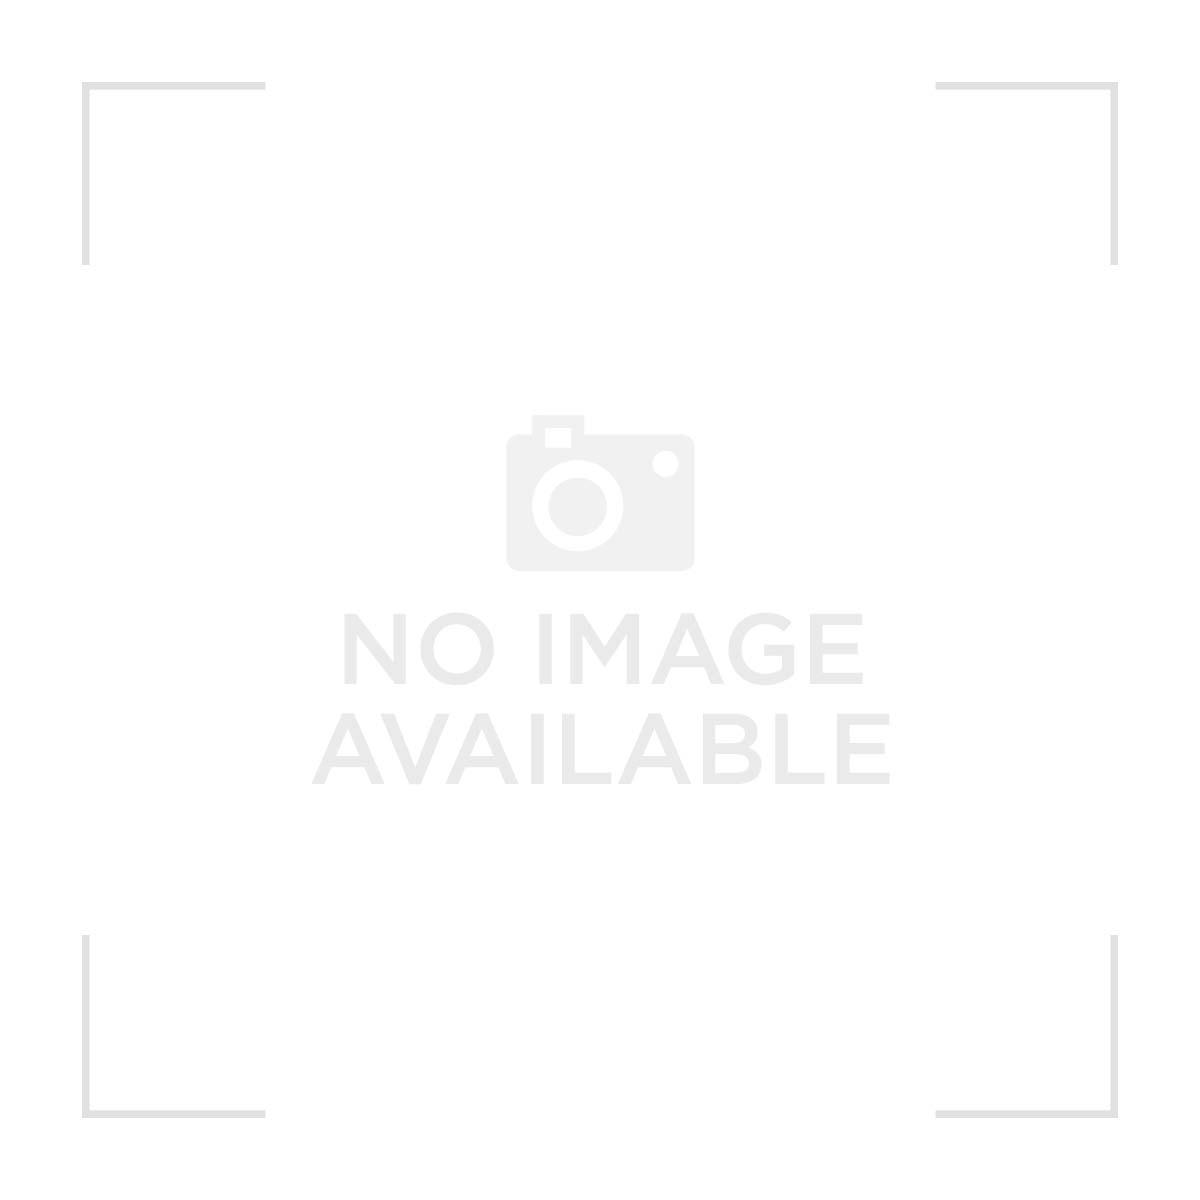 "Norpro Krona Deluxe 4"" Stainless Steel Double Mesh Strainer # 2152"